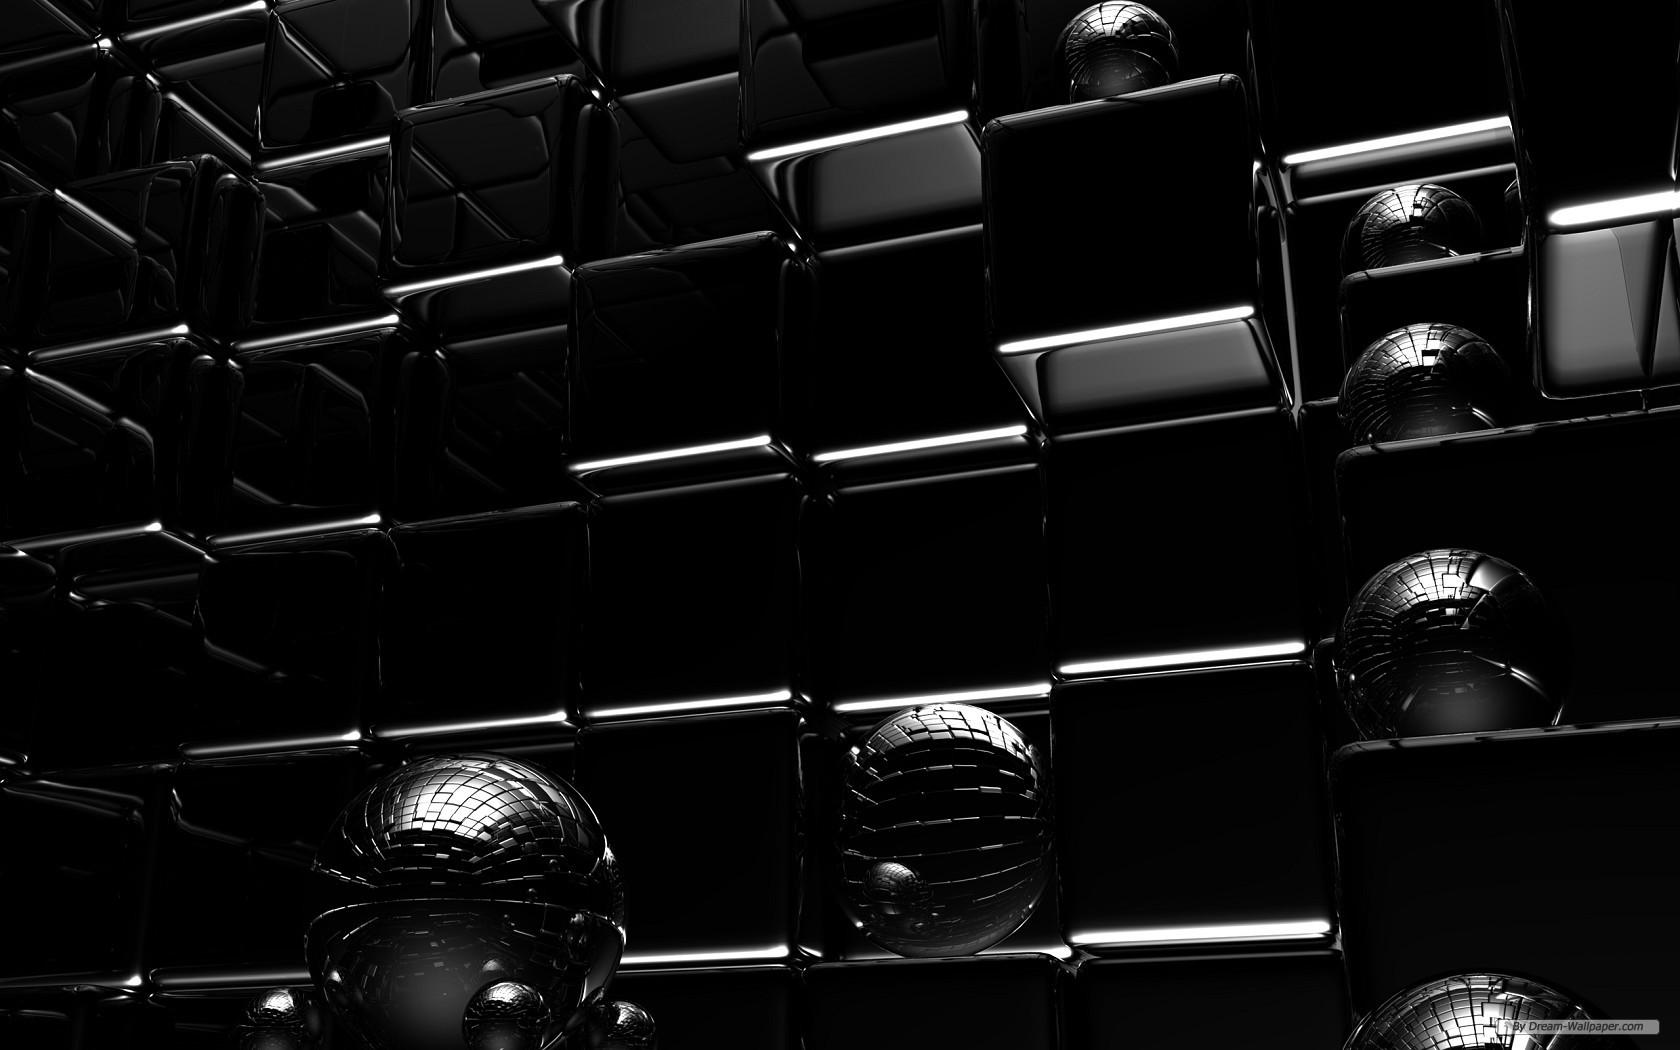 black design wallpaper 4 free wallpaper hdblackwallpapercom